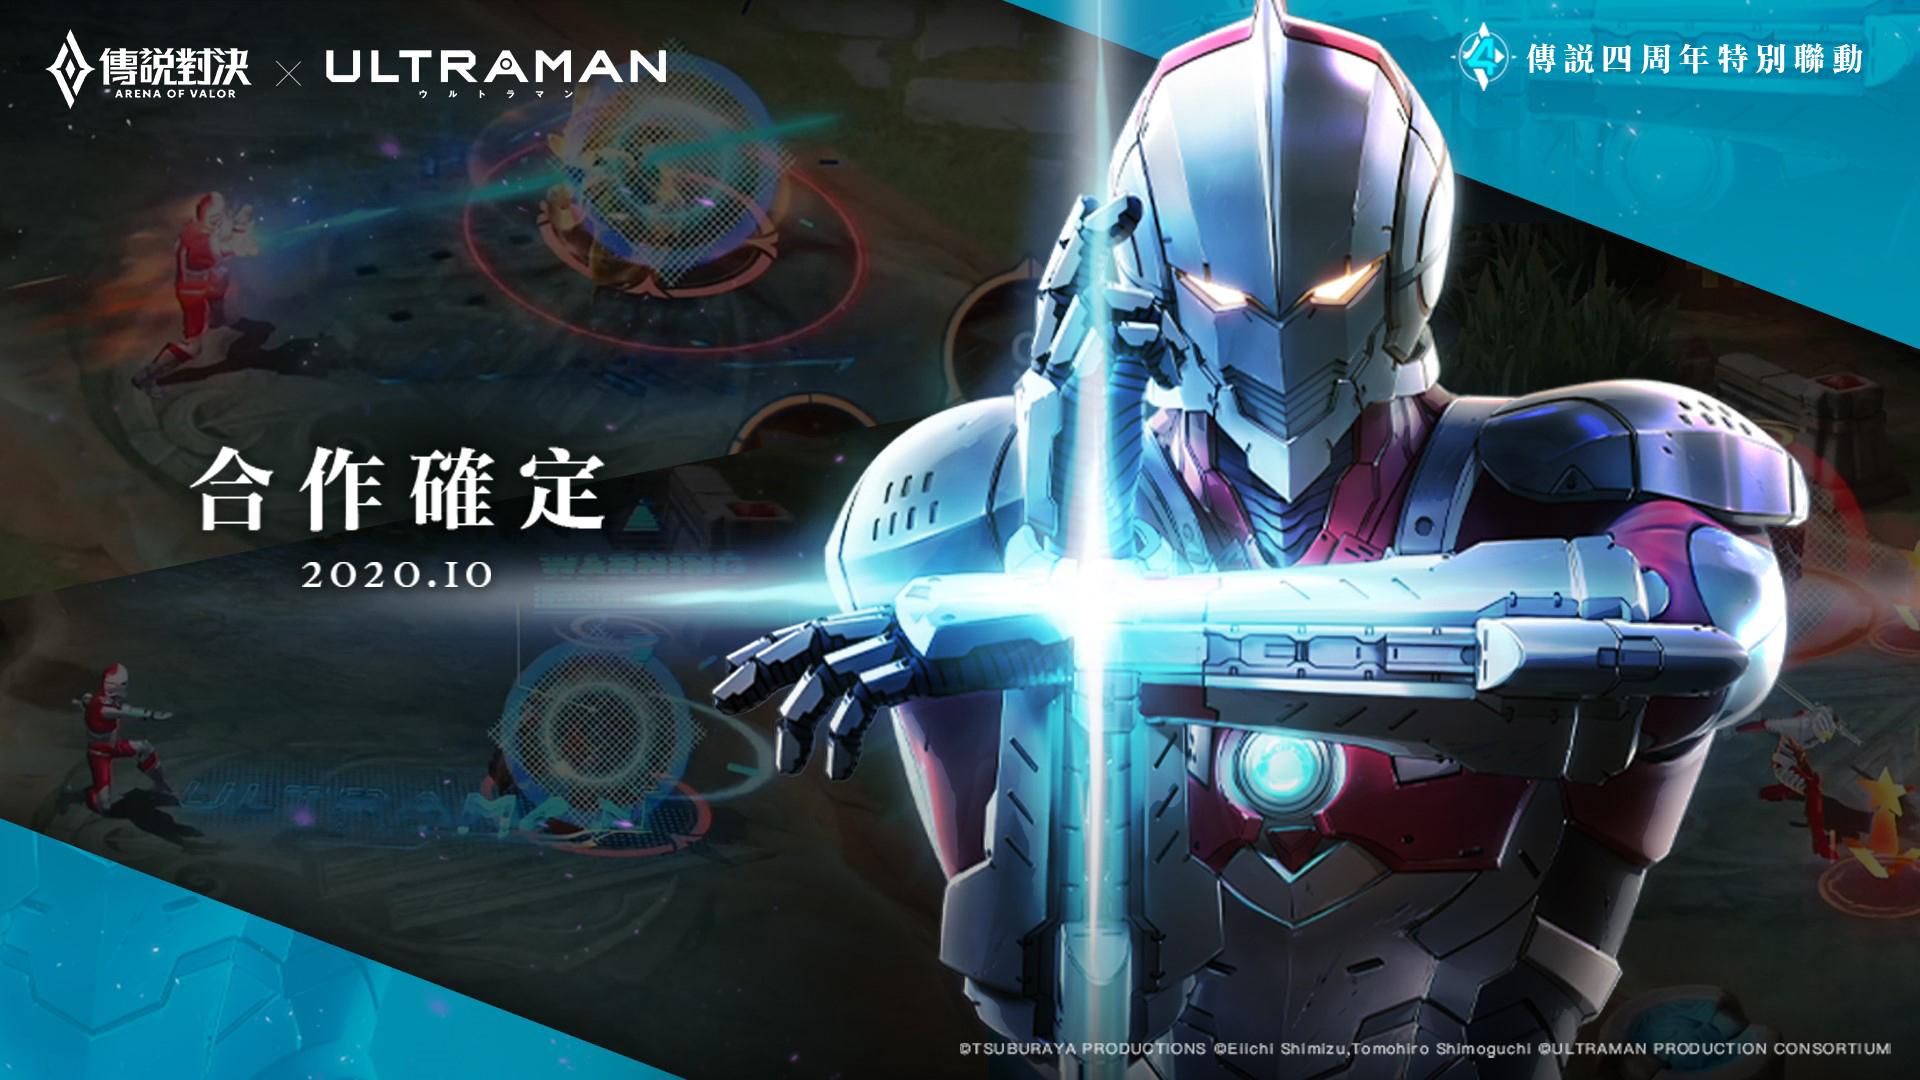 《Garena 傳說對決》X《ULTRAMAN》聯動合作確認!  「ULTRAM...